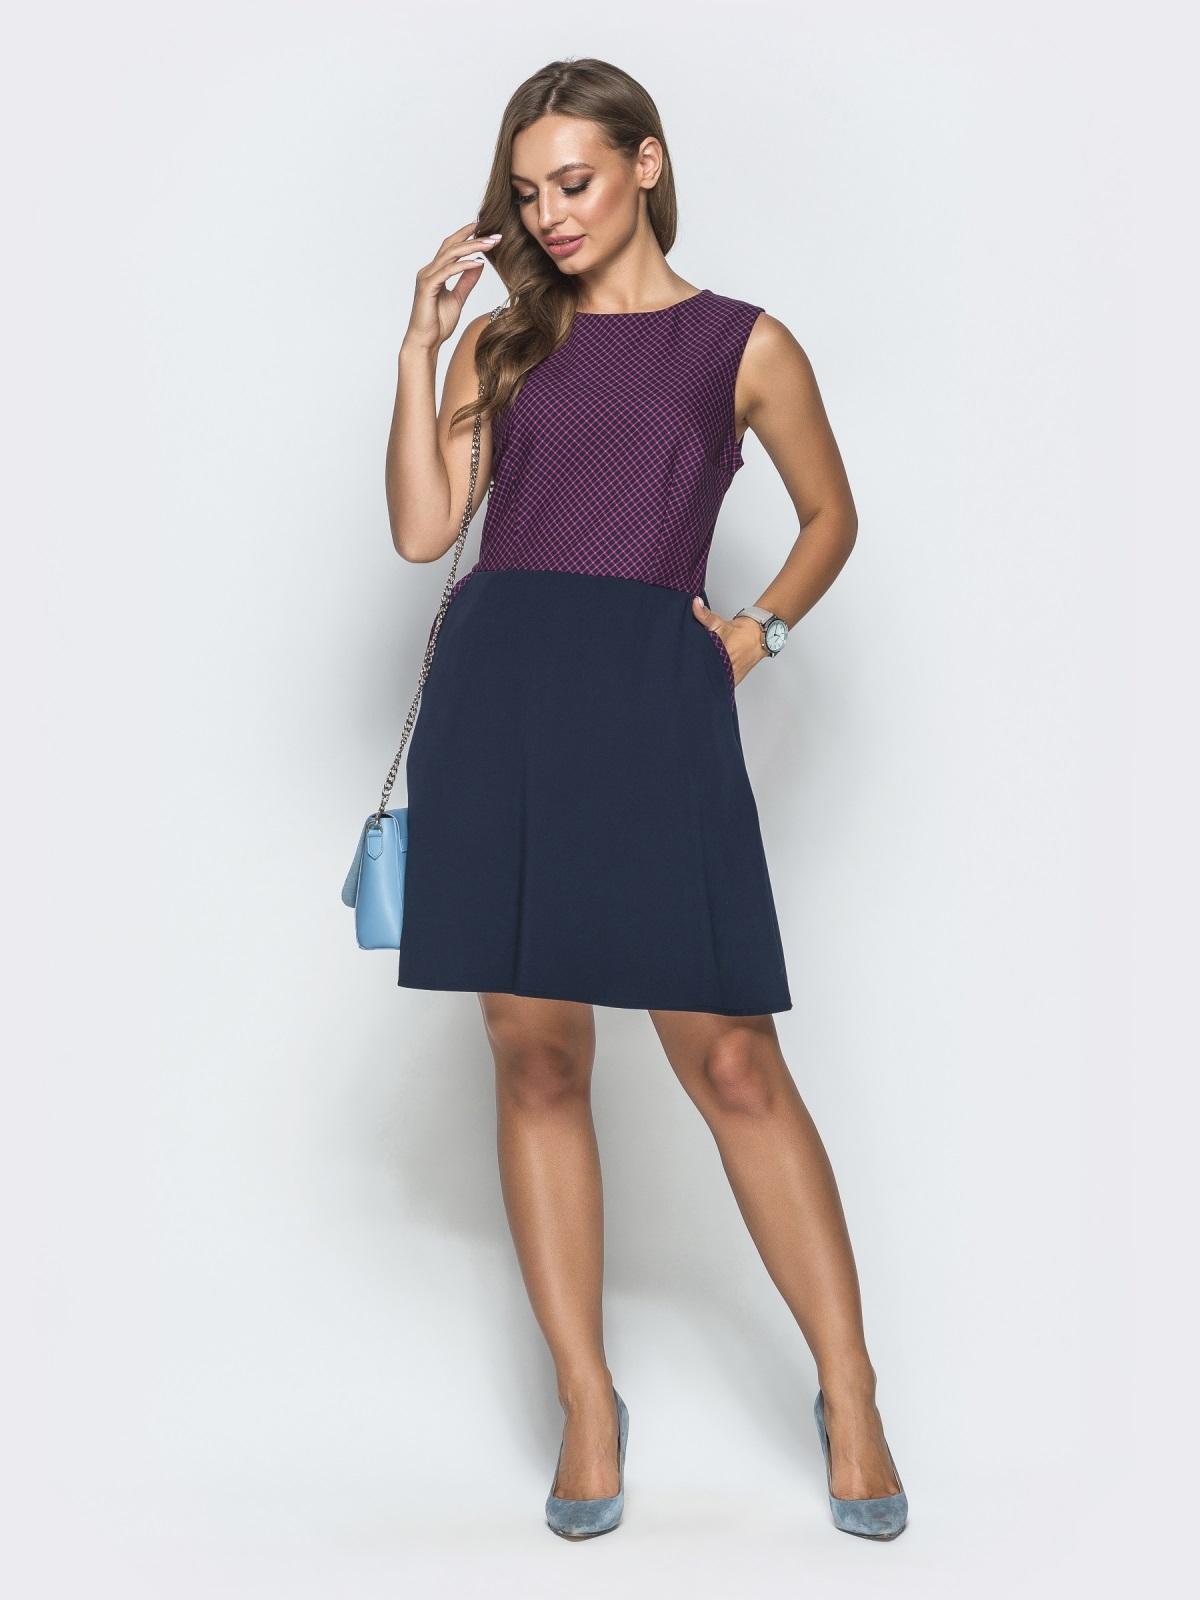 Тёмно-синее платье в розовую клетку с юбкой-трапецией 39790, фото 1